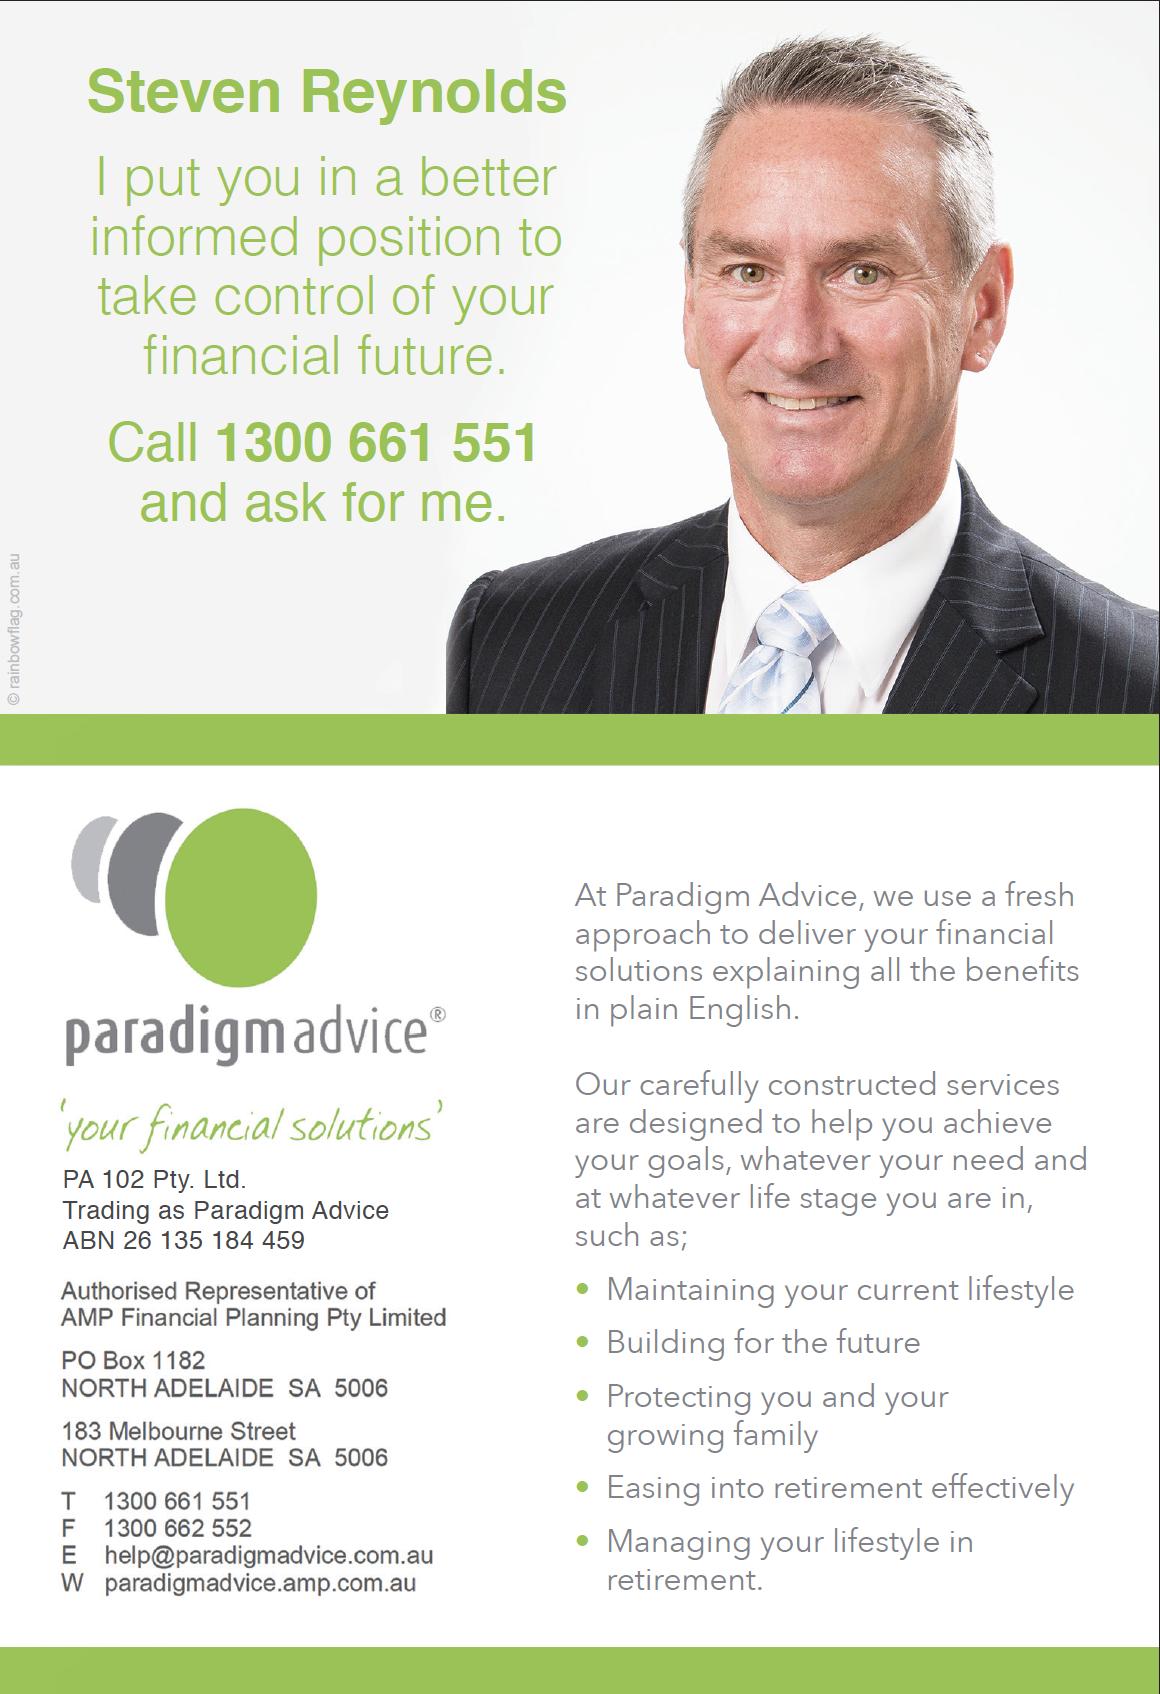 Paradigm Advice